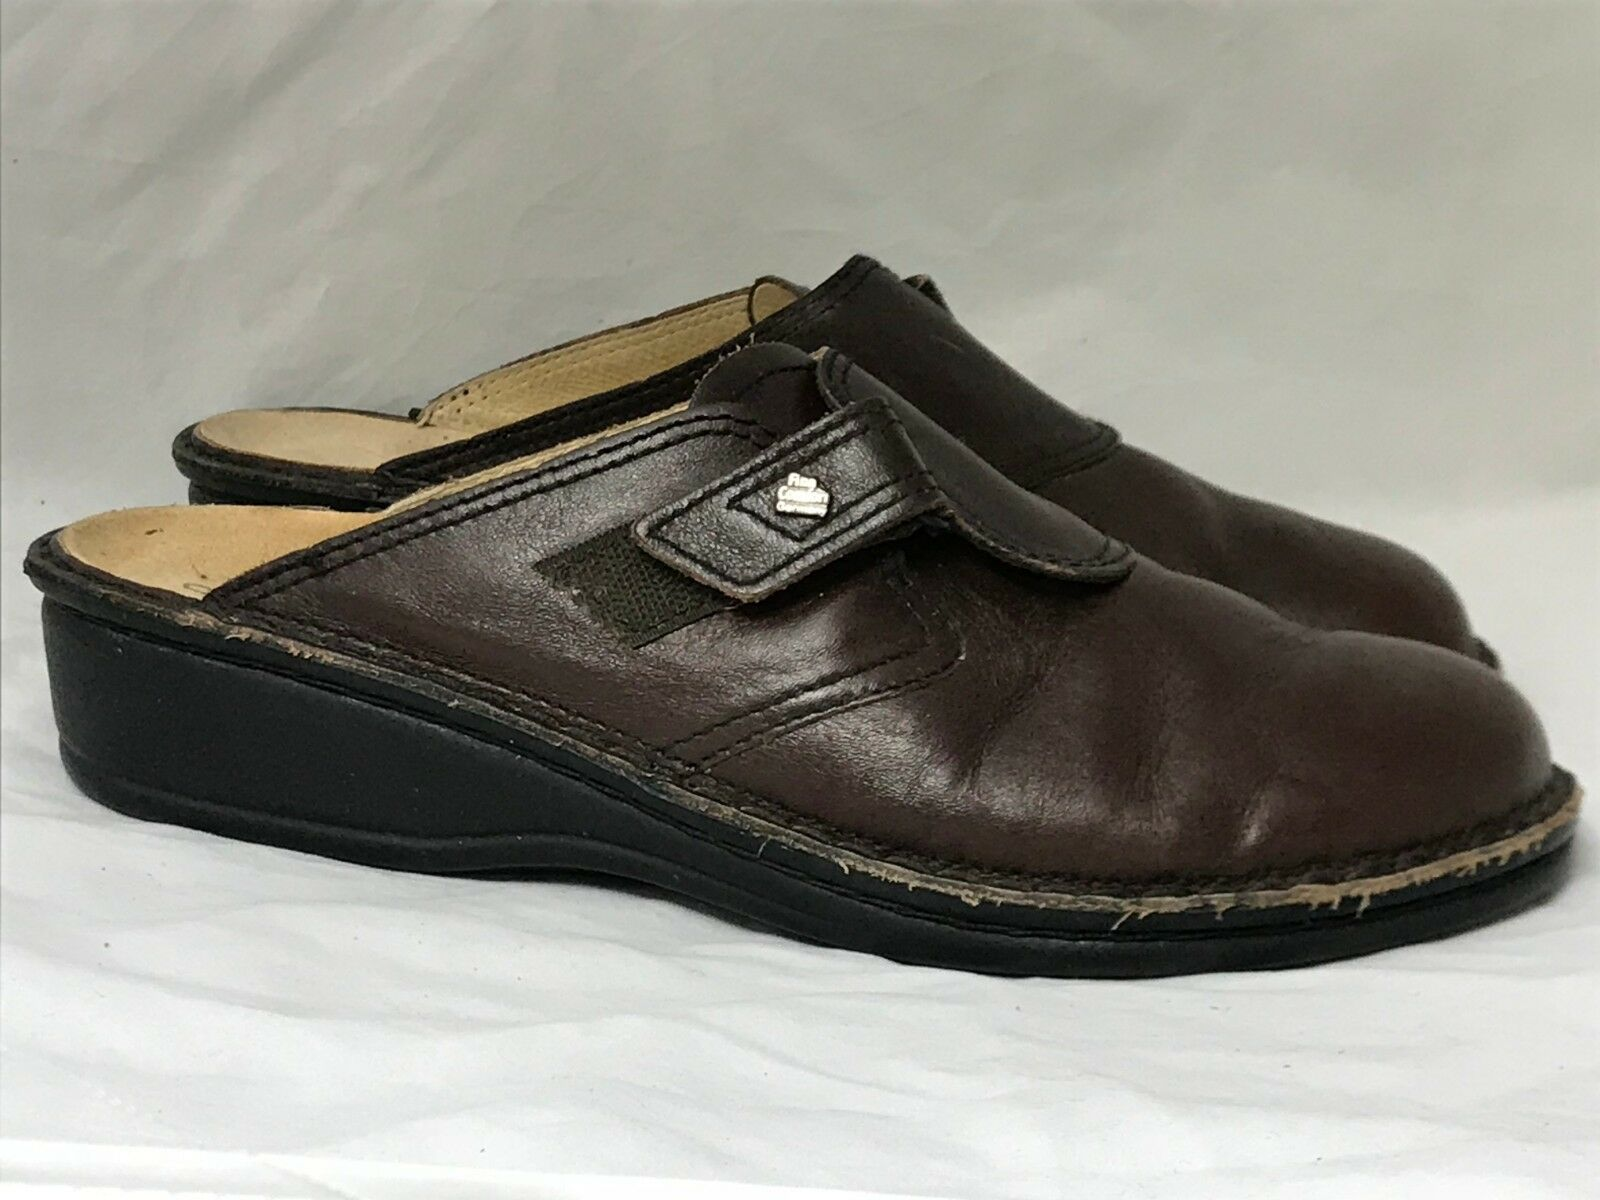 Finn Finn Finn Comfort Marrón Cuero Zapatos para mujer Talla 41 euros Slip On Hecho en Alemania  autentico en linea